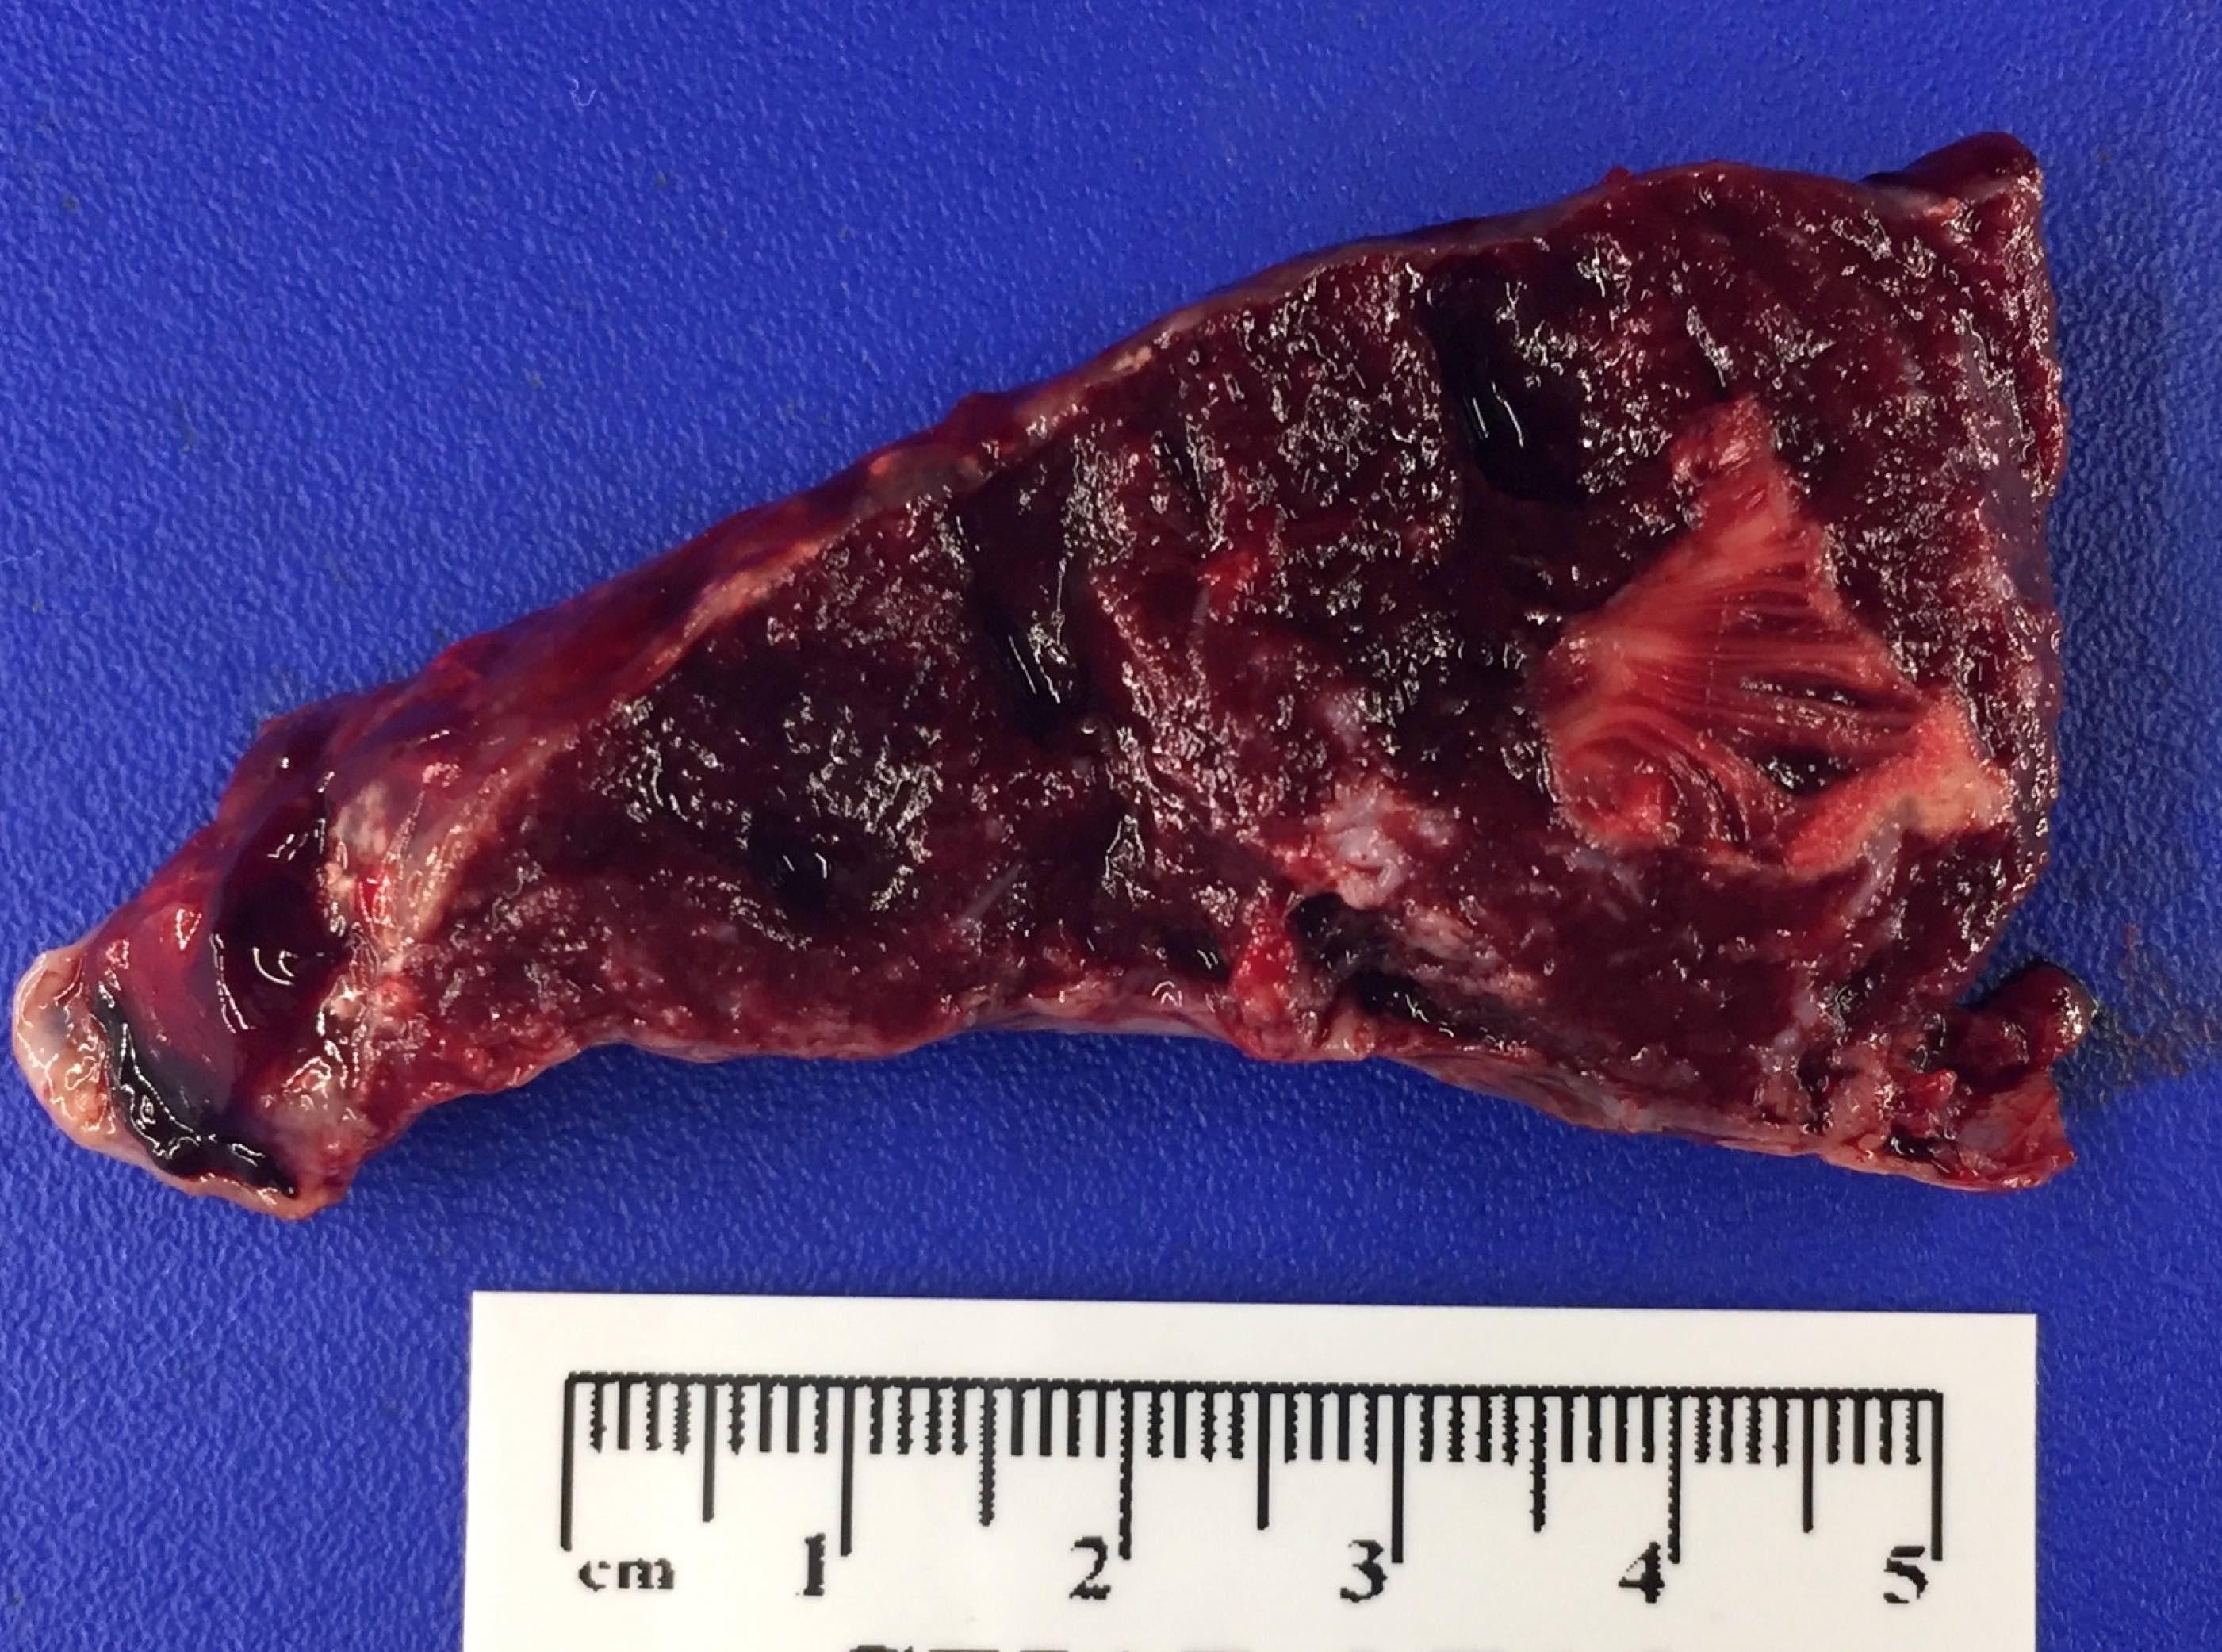 Intraplacental hematoma